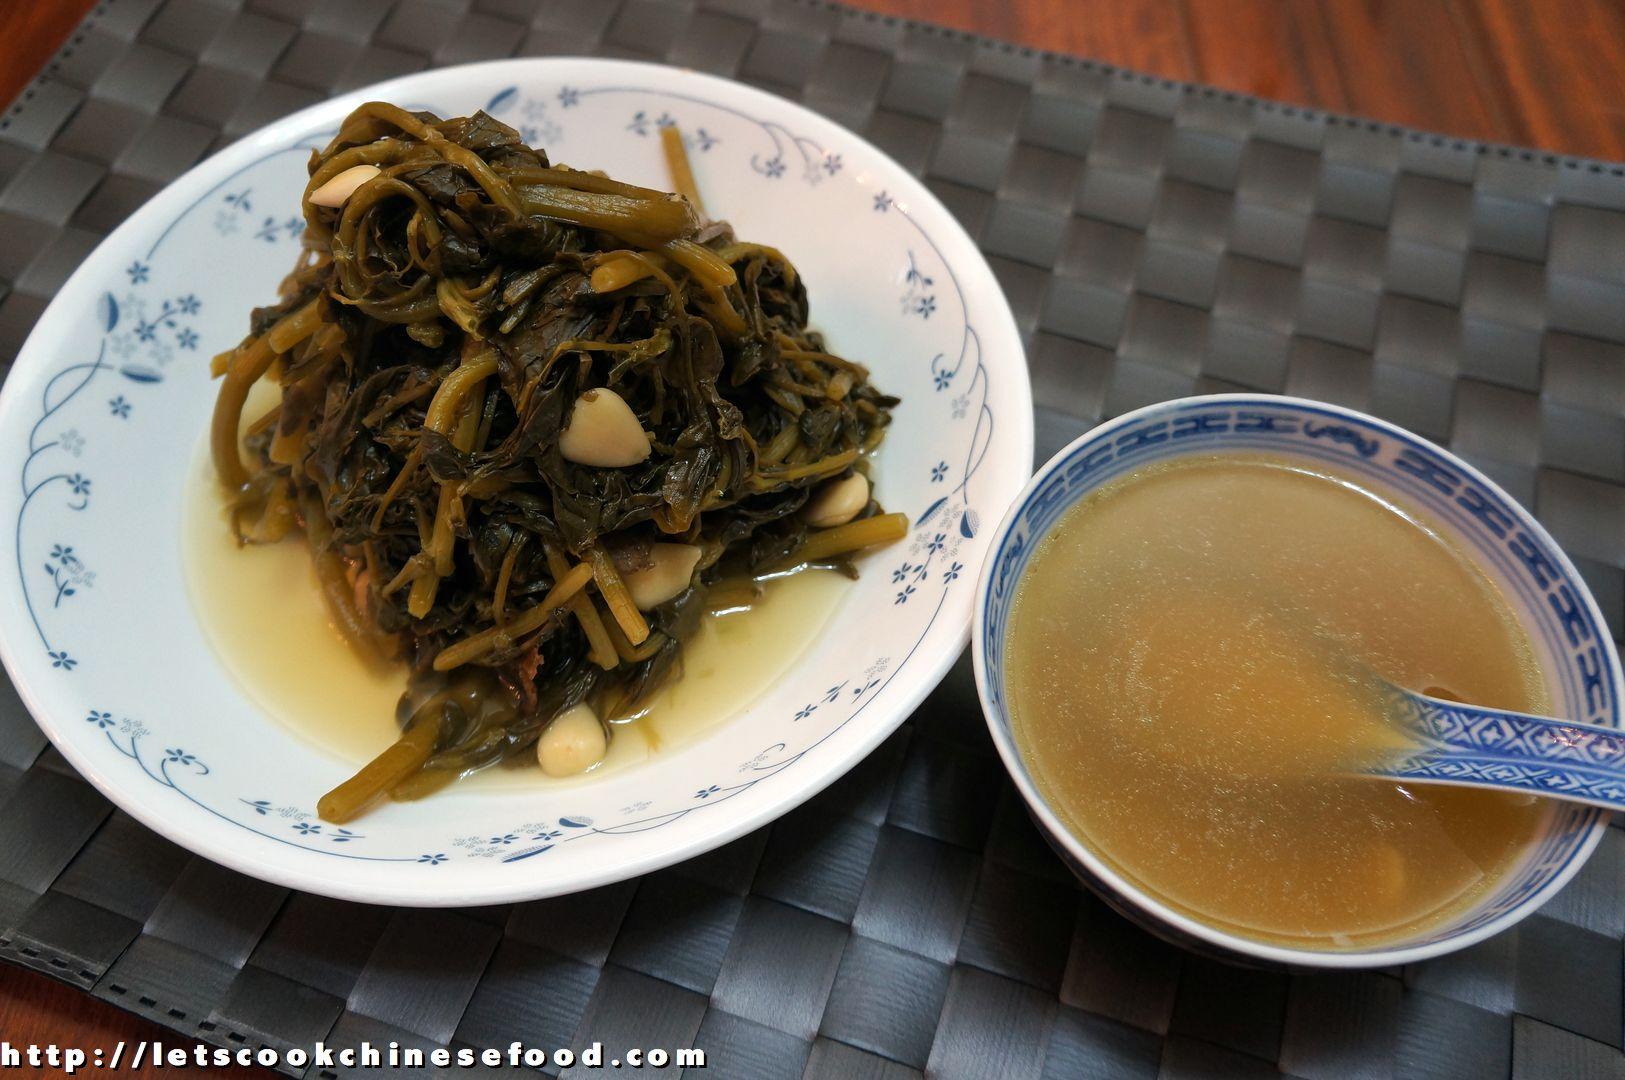 Chinese recipewatercress with blotched snakehead fish soup chinese recipe watercress with blotched snakehead fish soupfor 12 persons forumfinder Choice Image